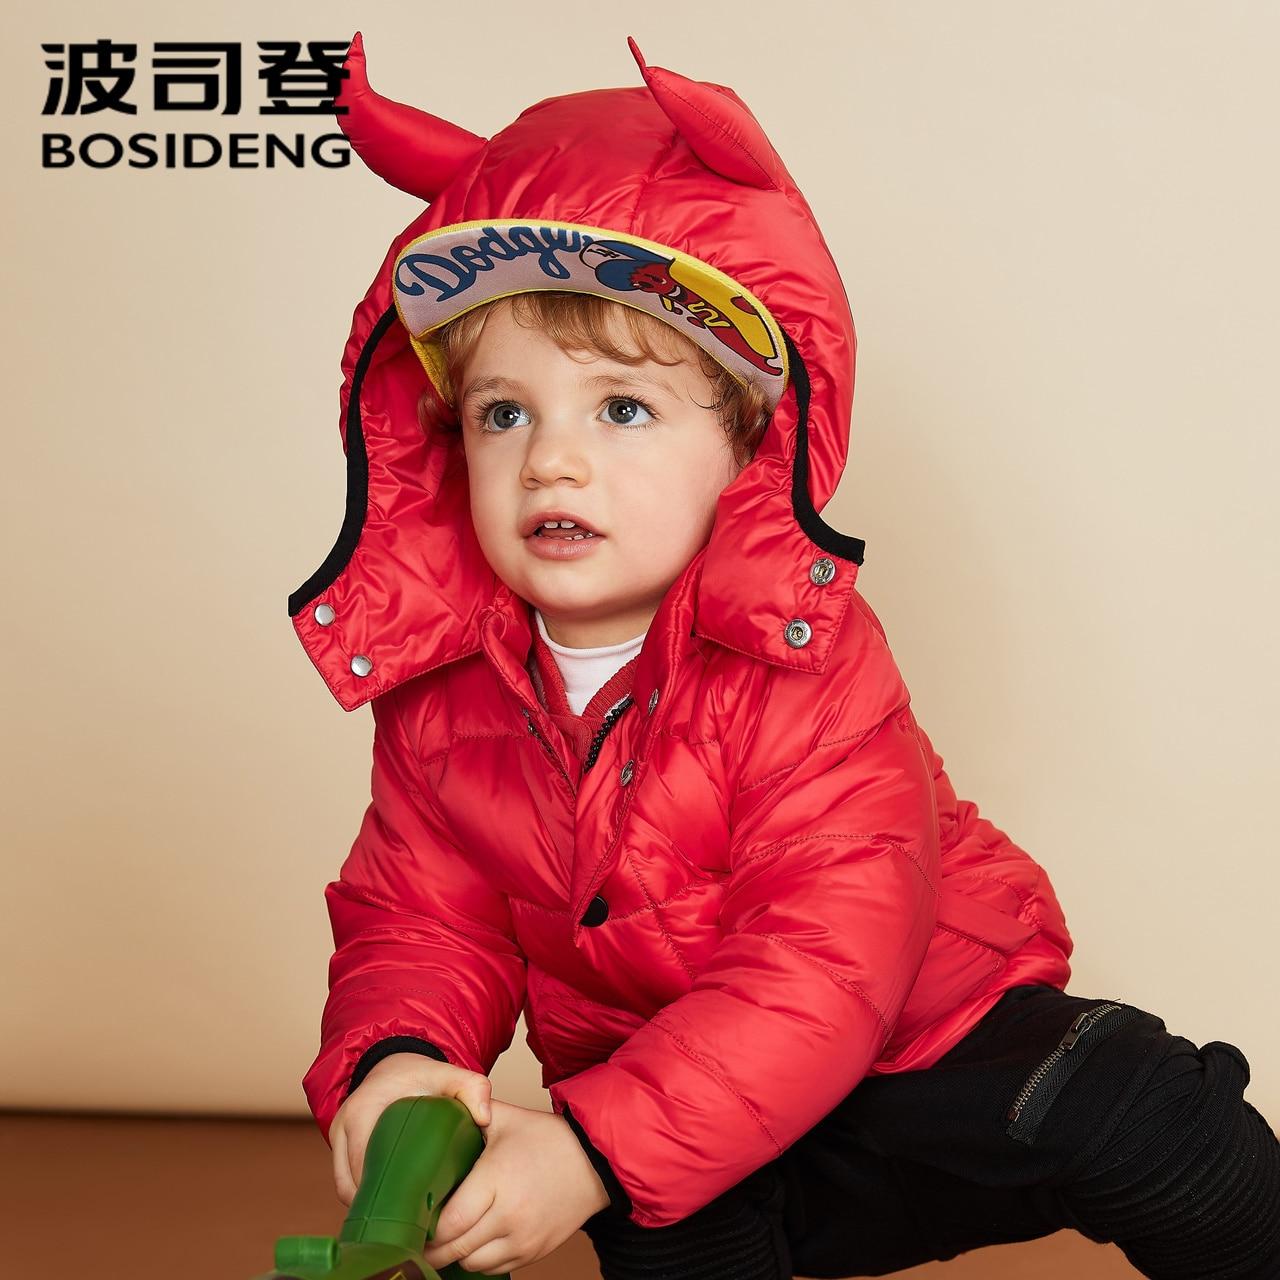 BOSIDENG Kids Boys & Girls Winter Duck Down Coat Short Down Jacket Hooded Evil Ear Tail Hood Ultra Light High QualityT80142505DS